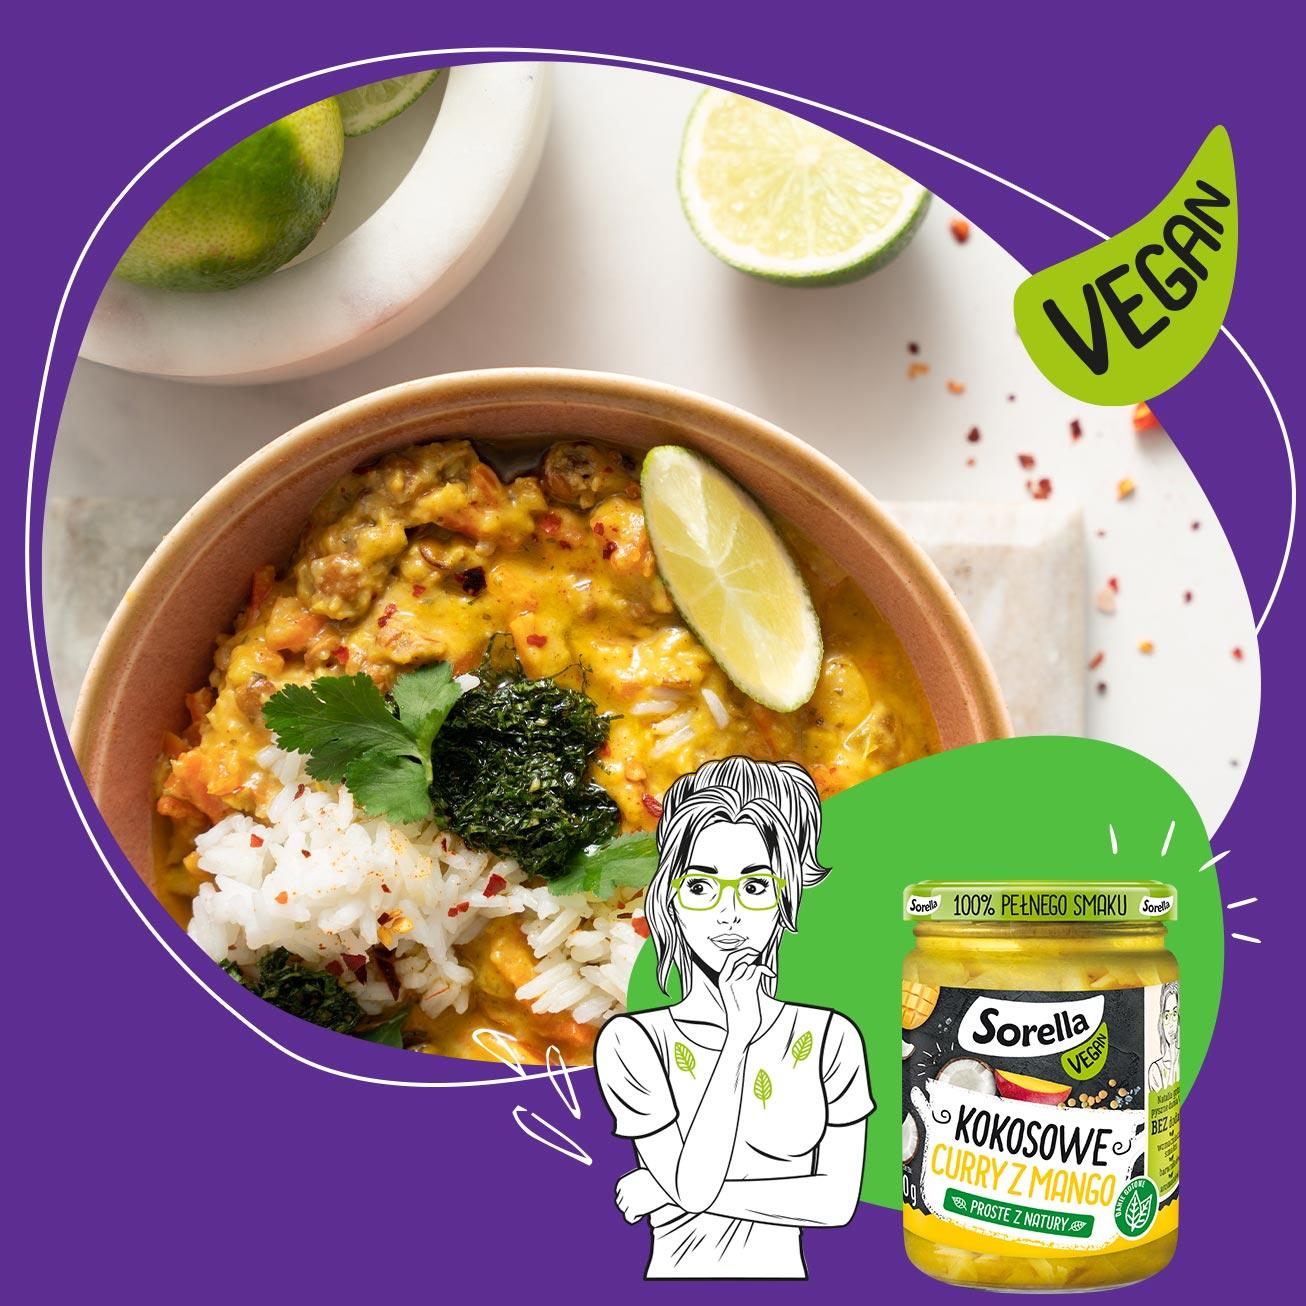 Coconut mango curry with jasmine rice, coriander, and mint salsa